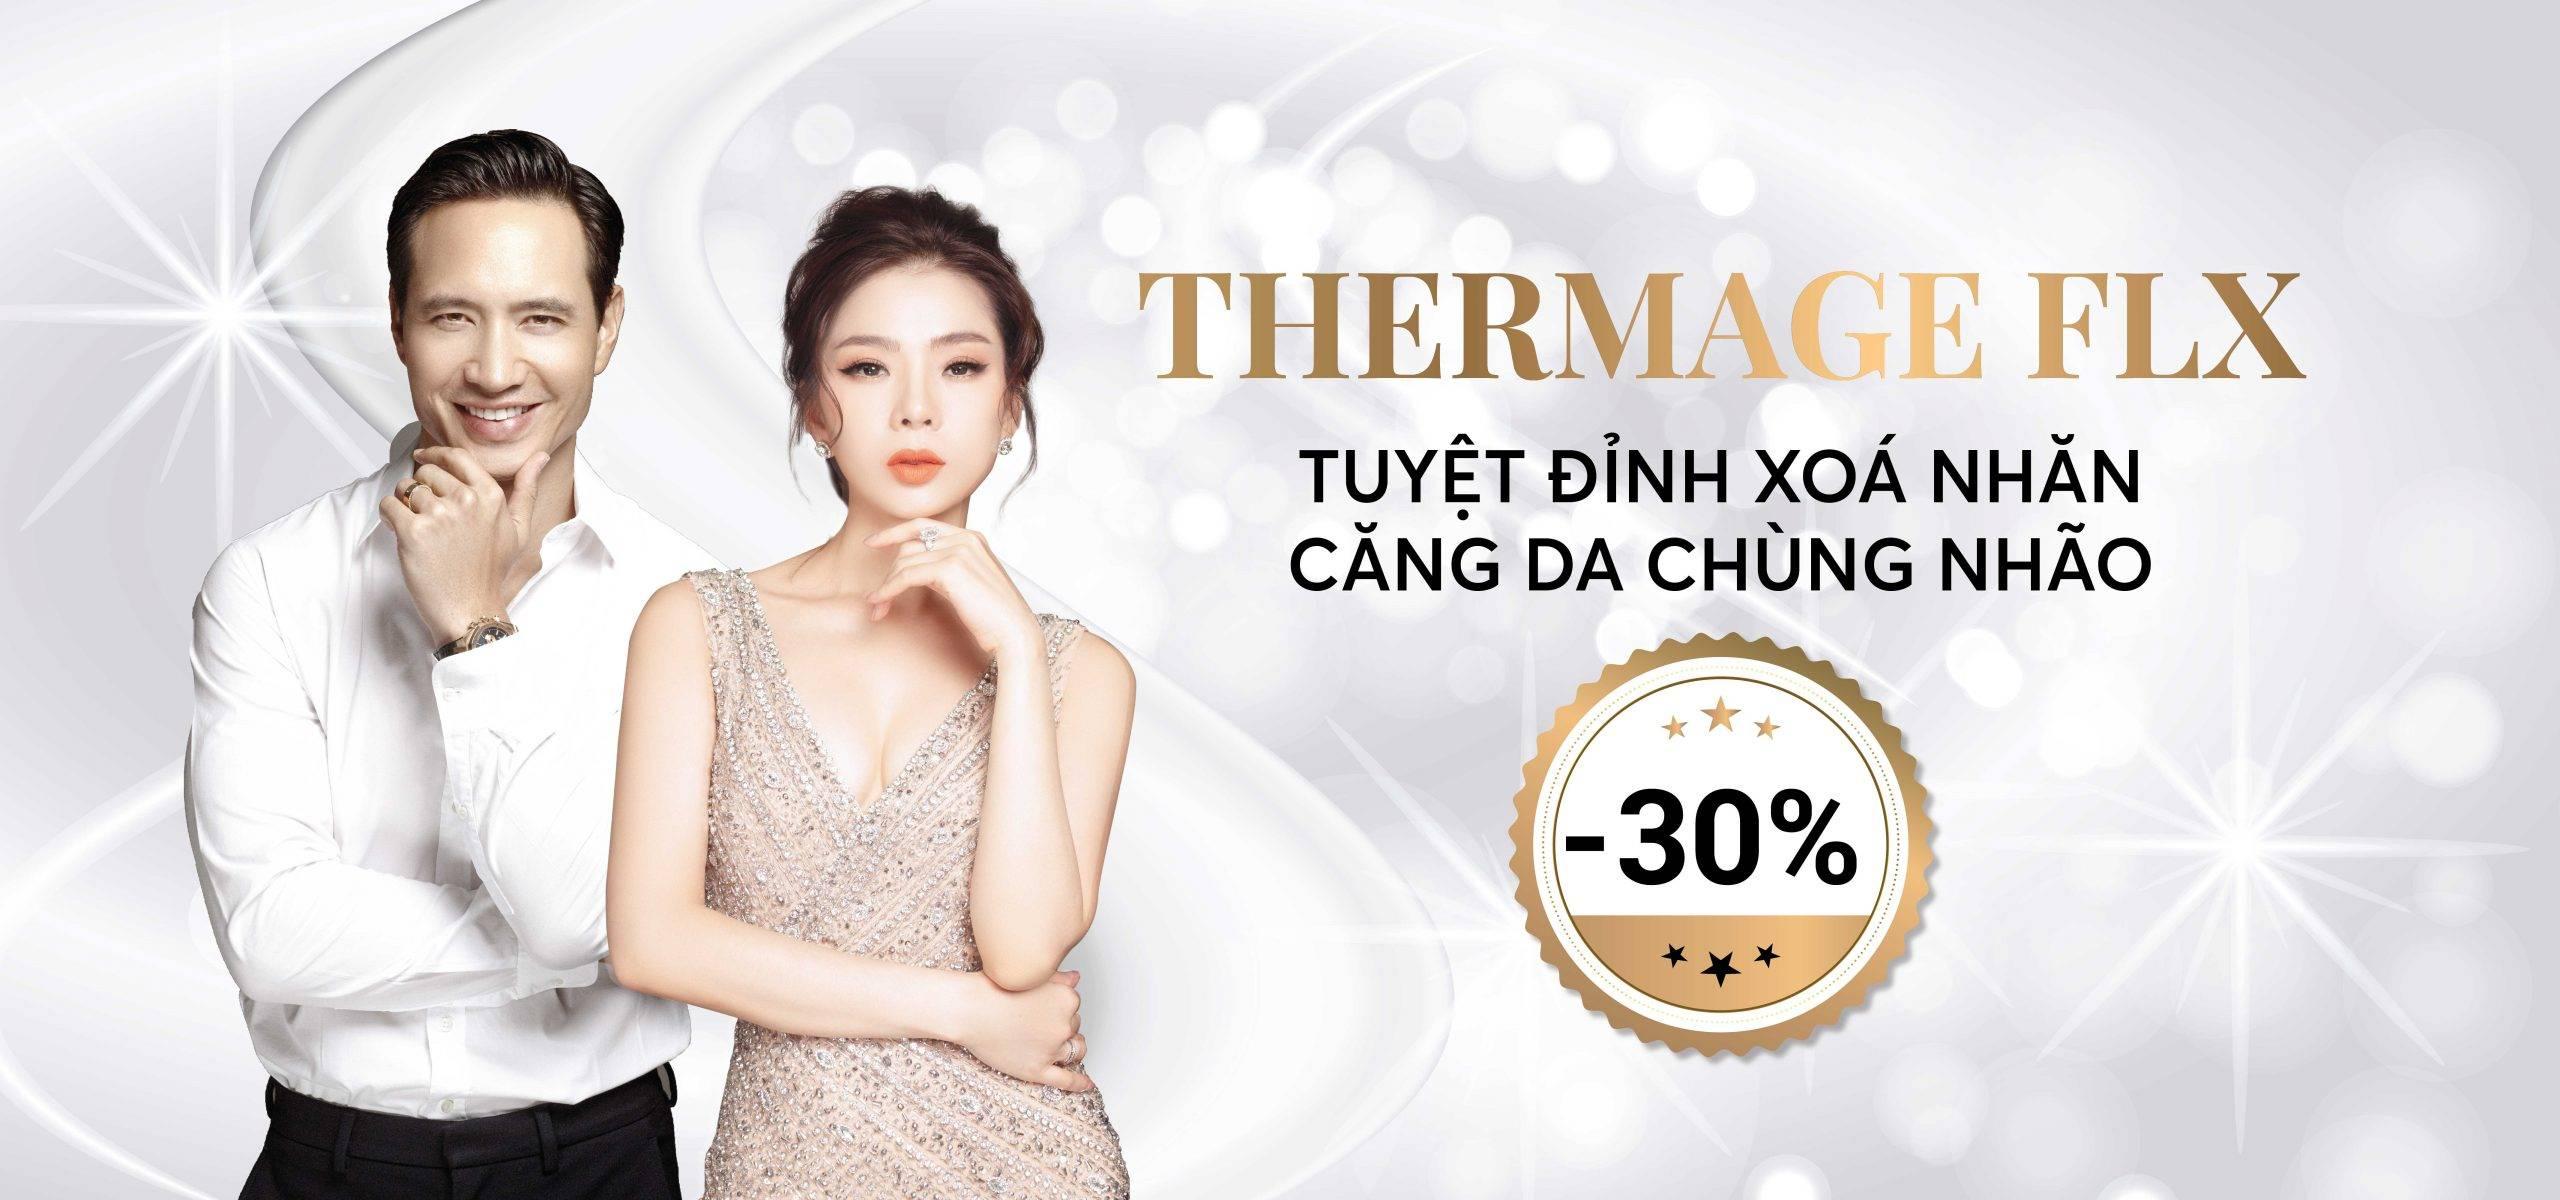 banner-uu-dai-thermage-flx